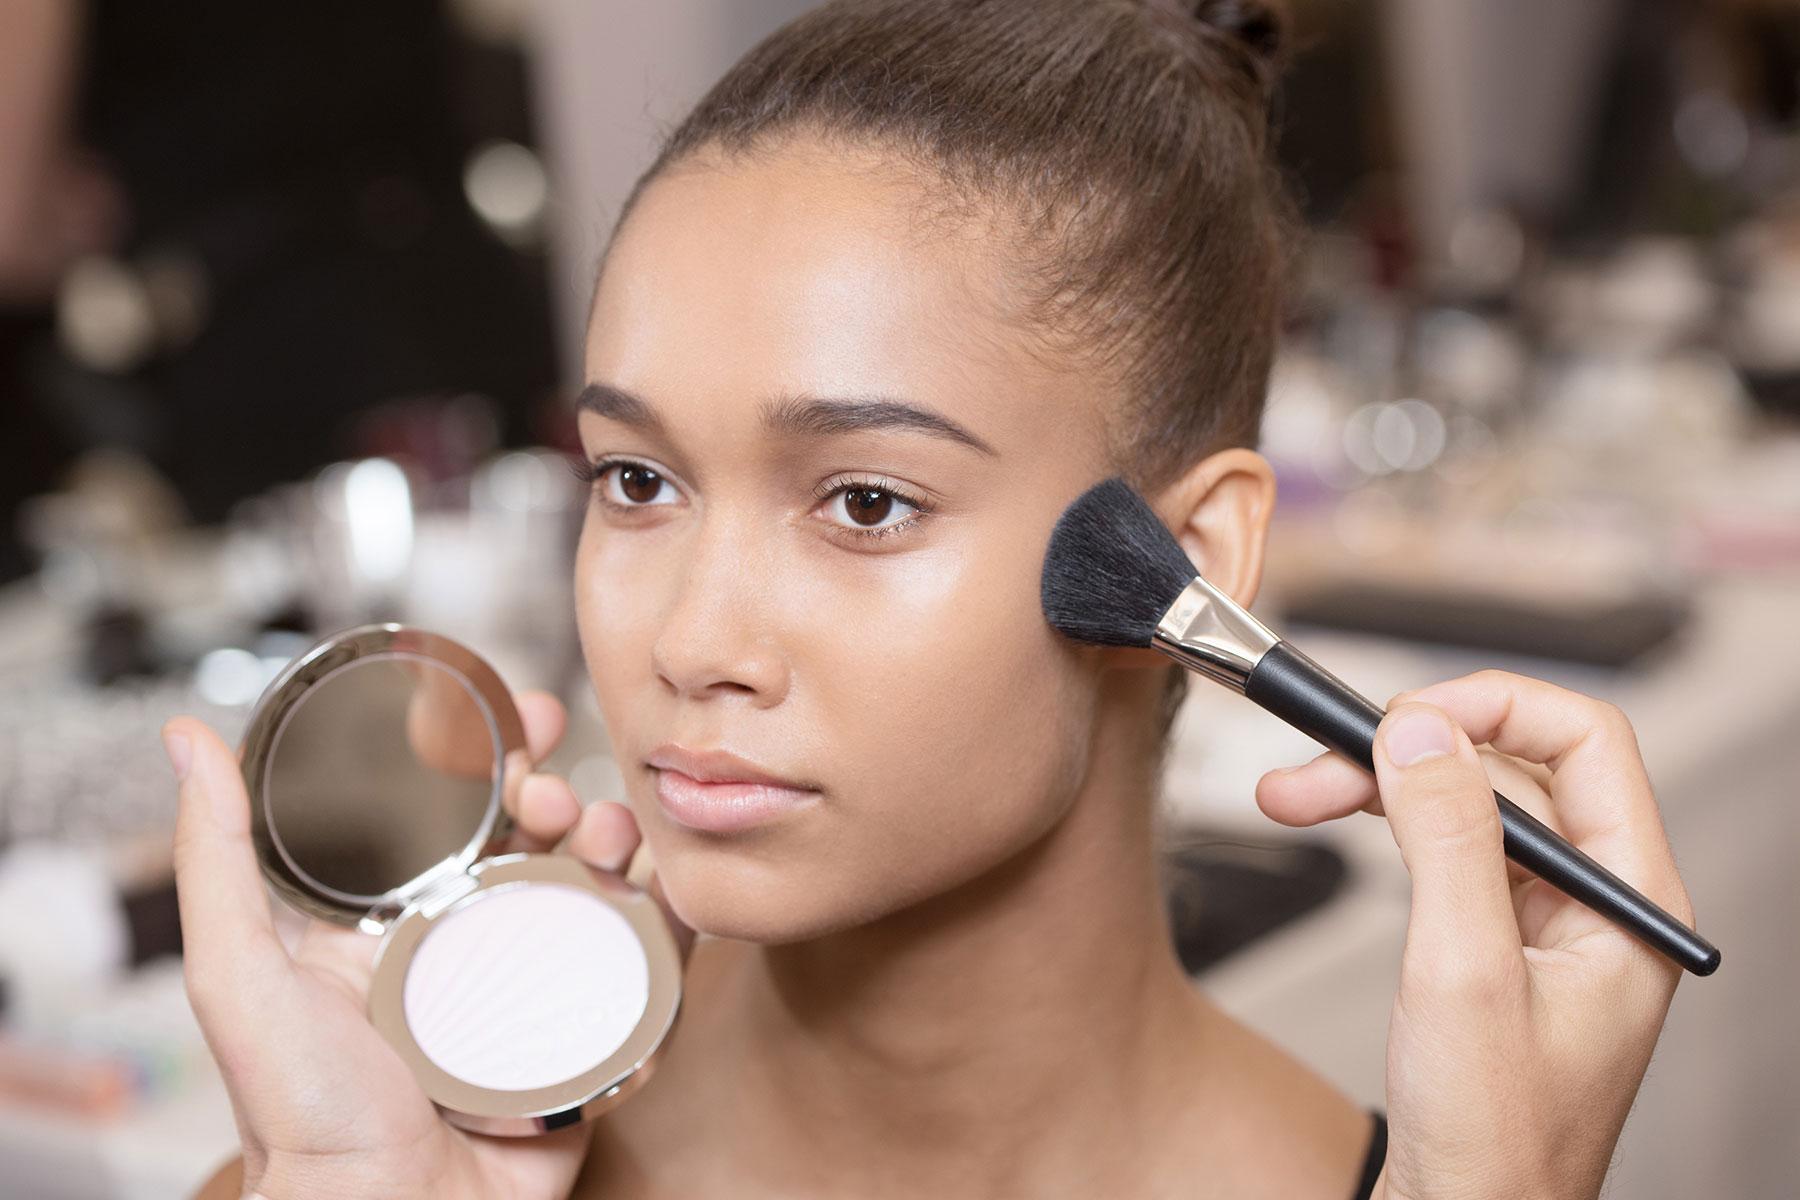 dior-makeup-highlighter-spring-2017